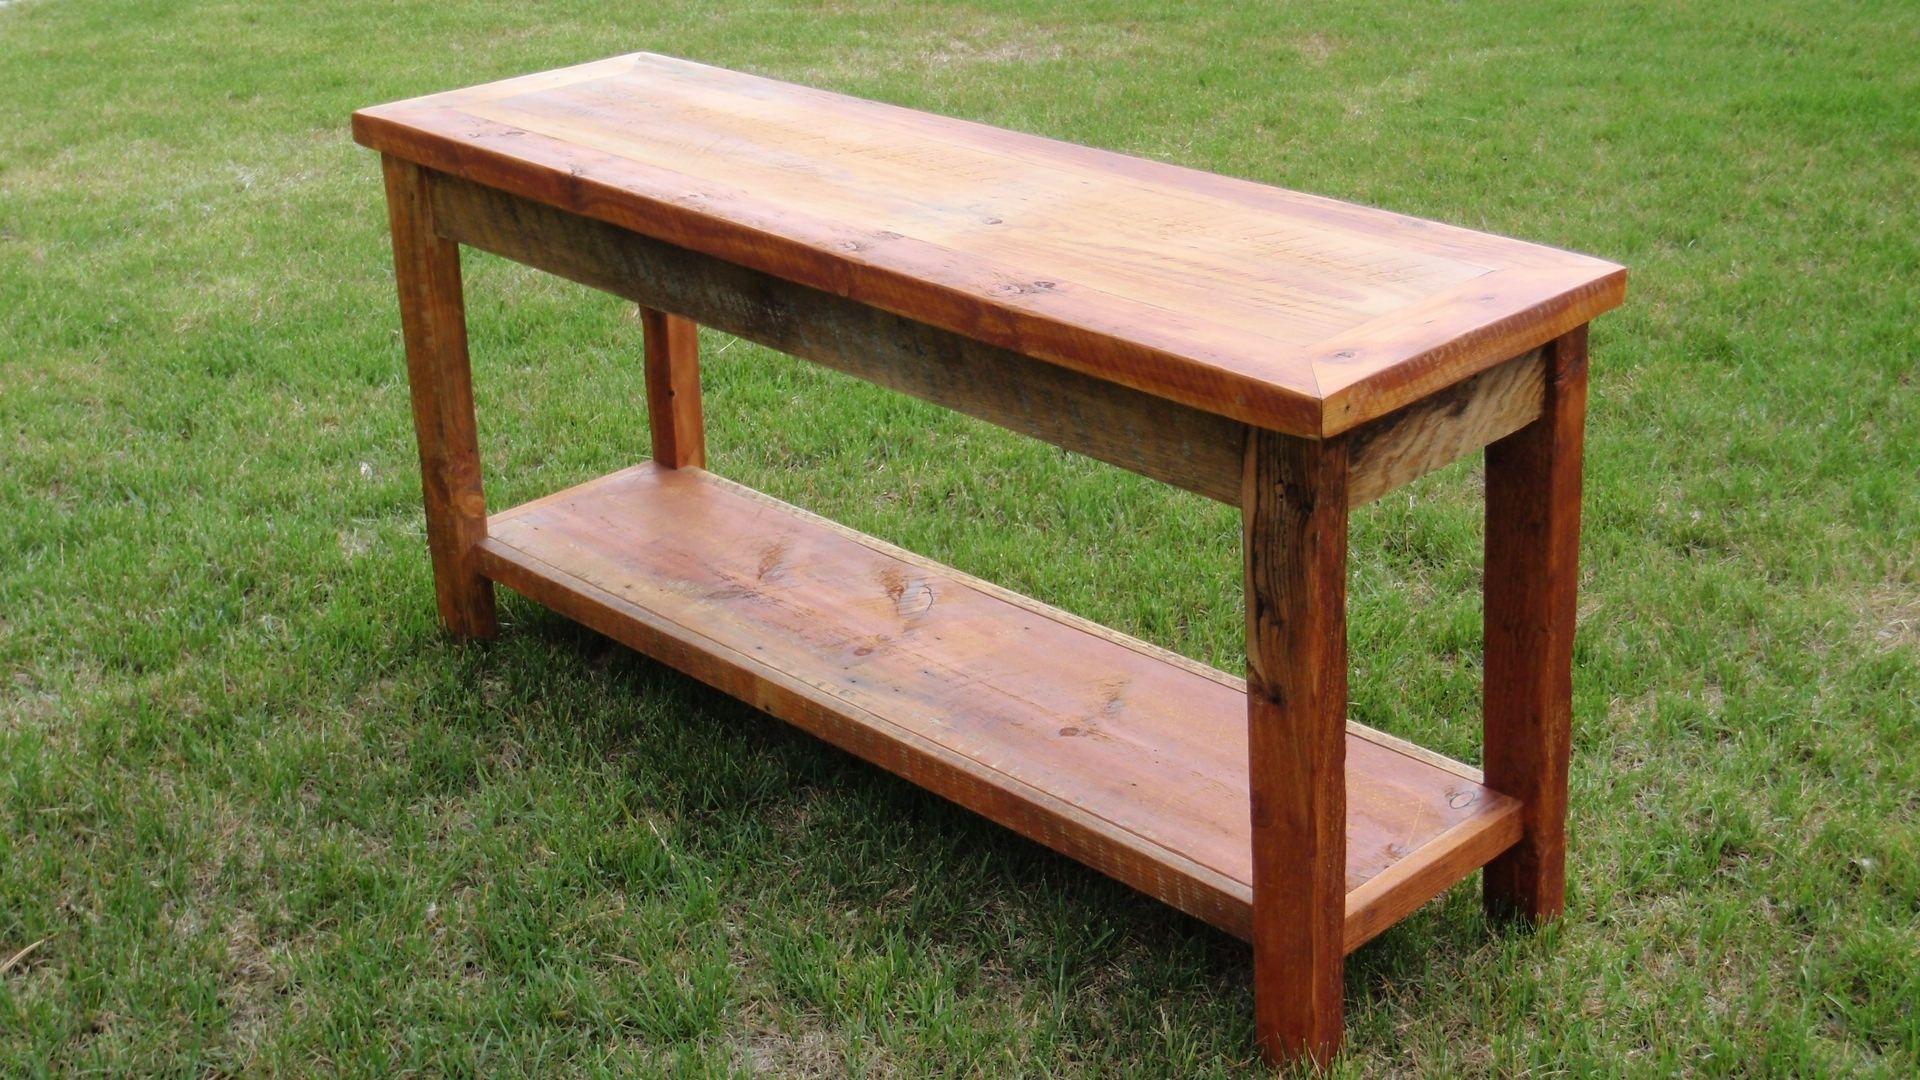 custom made sofa tables dolphin fabric 3 2 beige brown set handmade barnwood table by son ranch furnishings